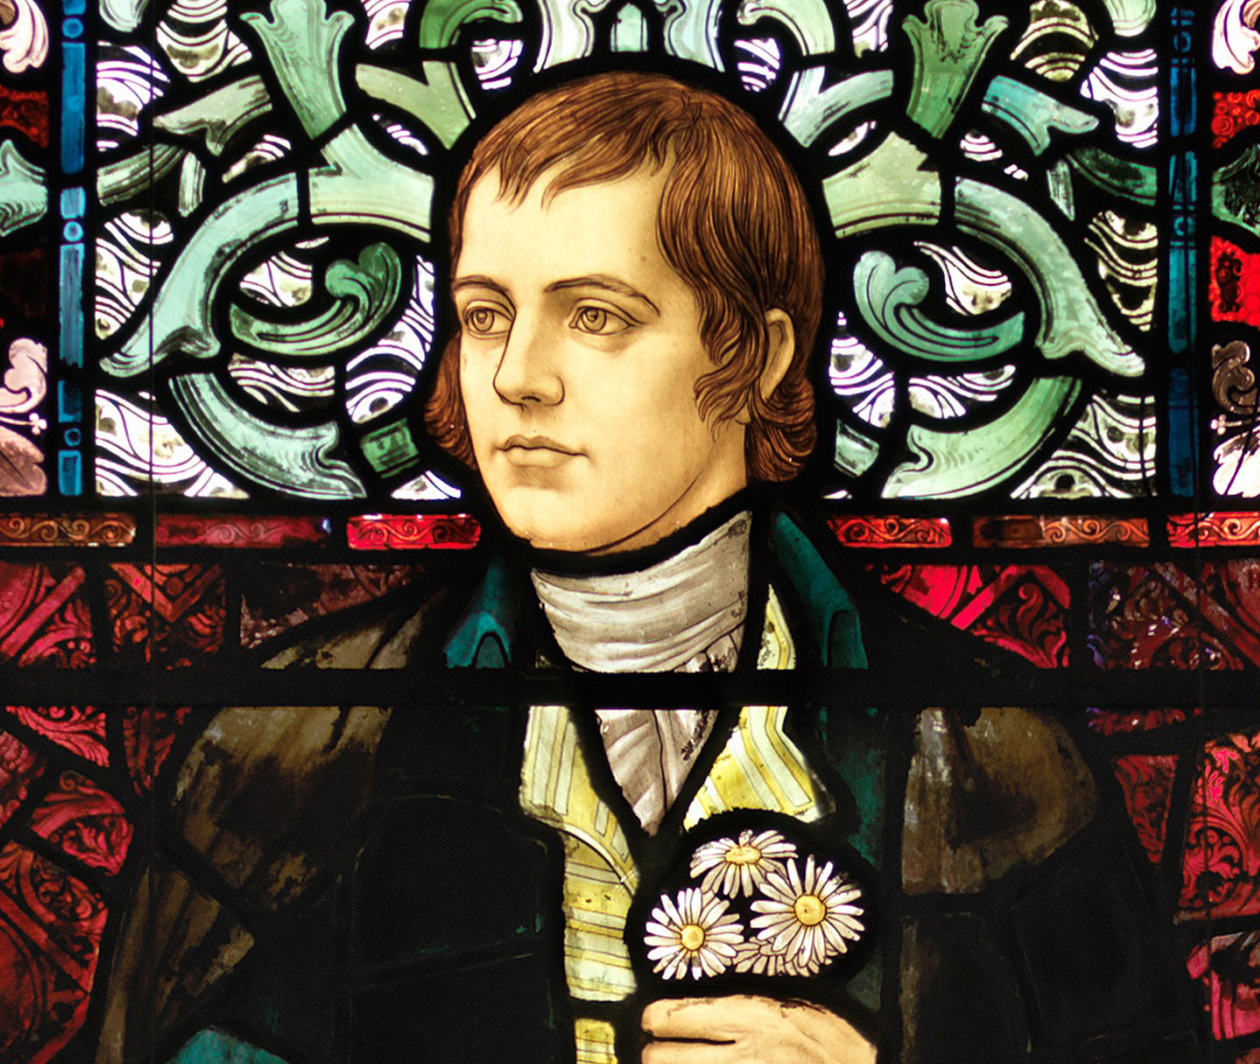 Robert Burns: Poems, Songs and Legacy